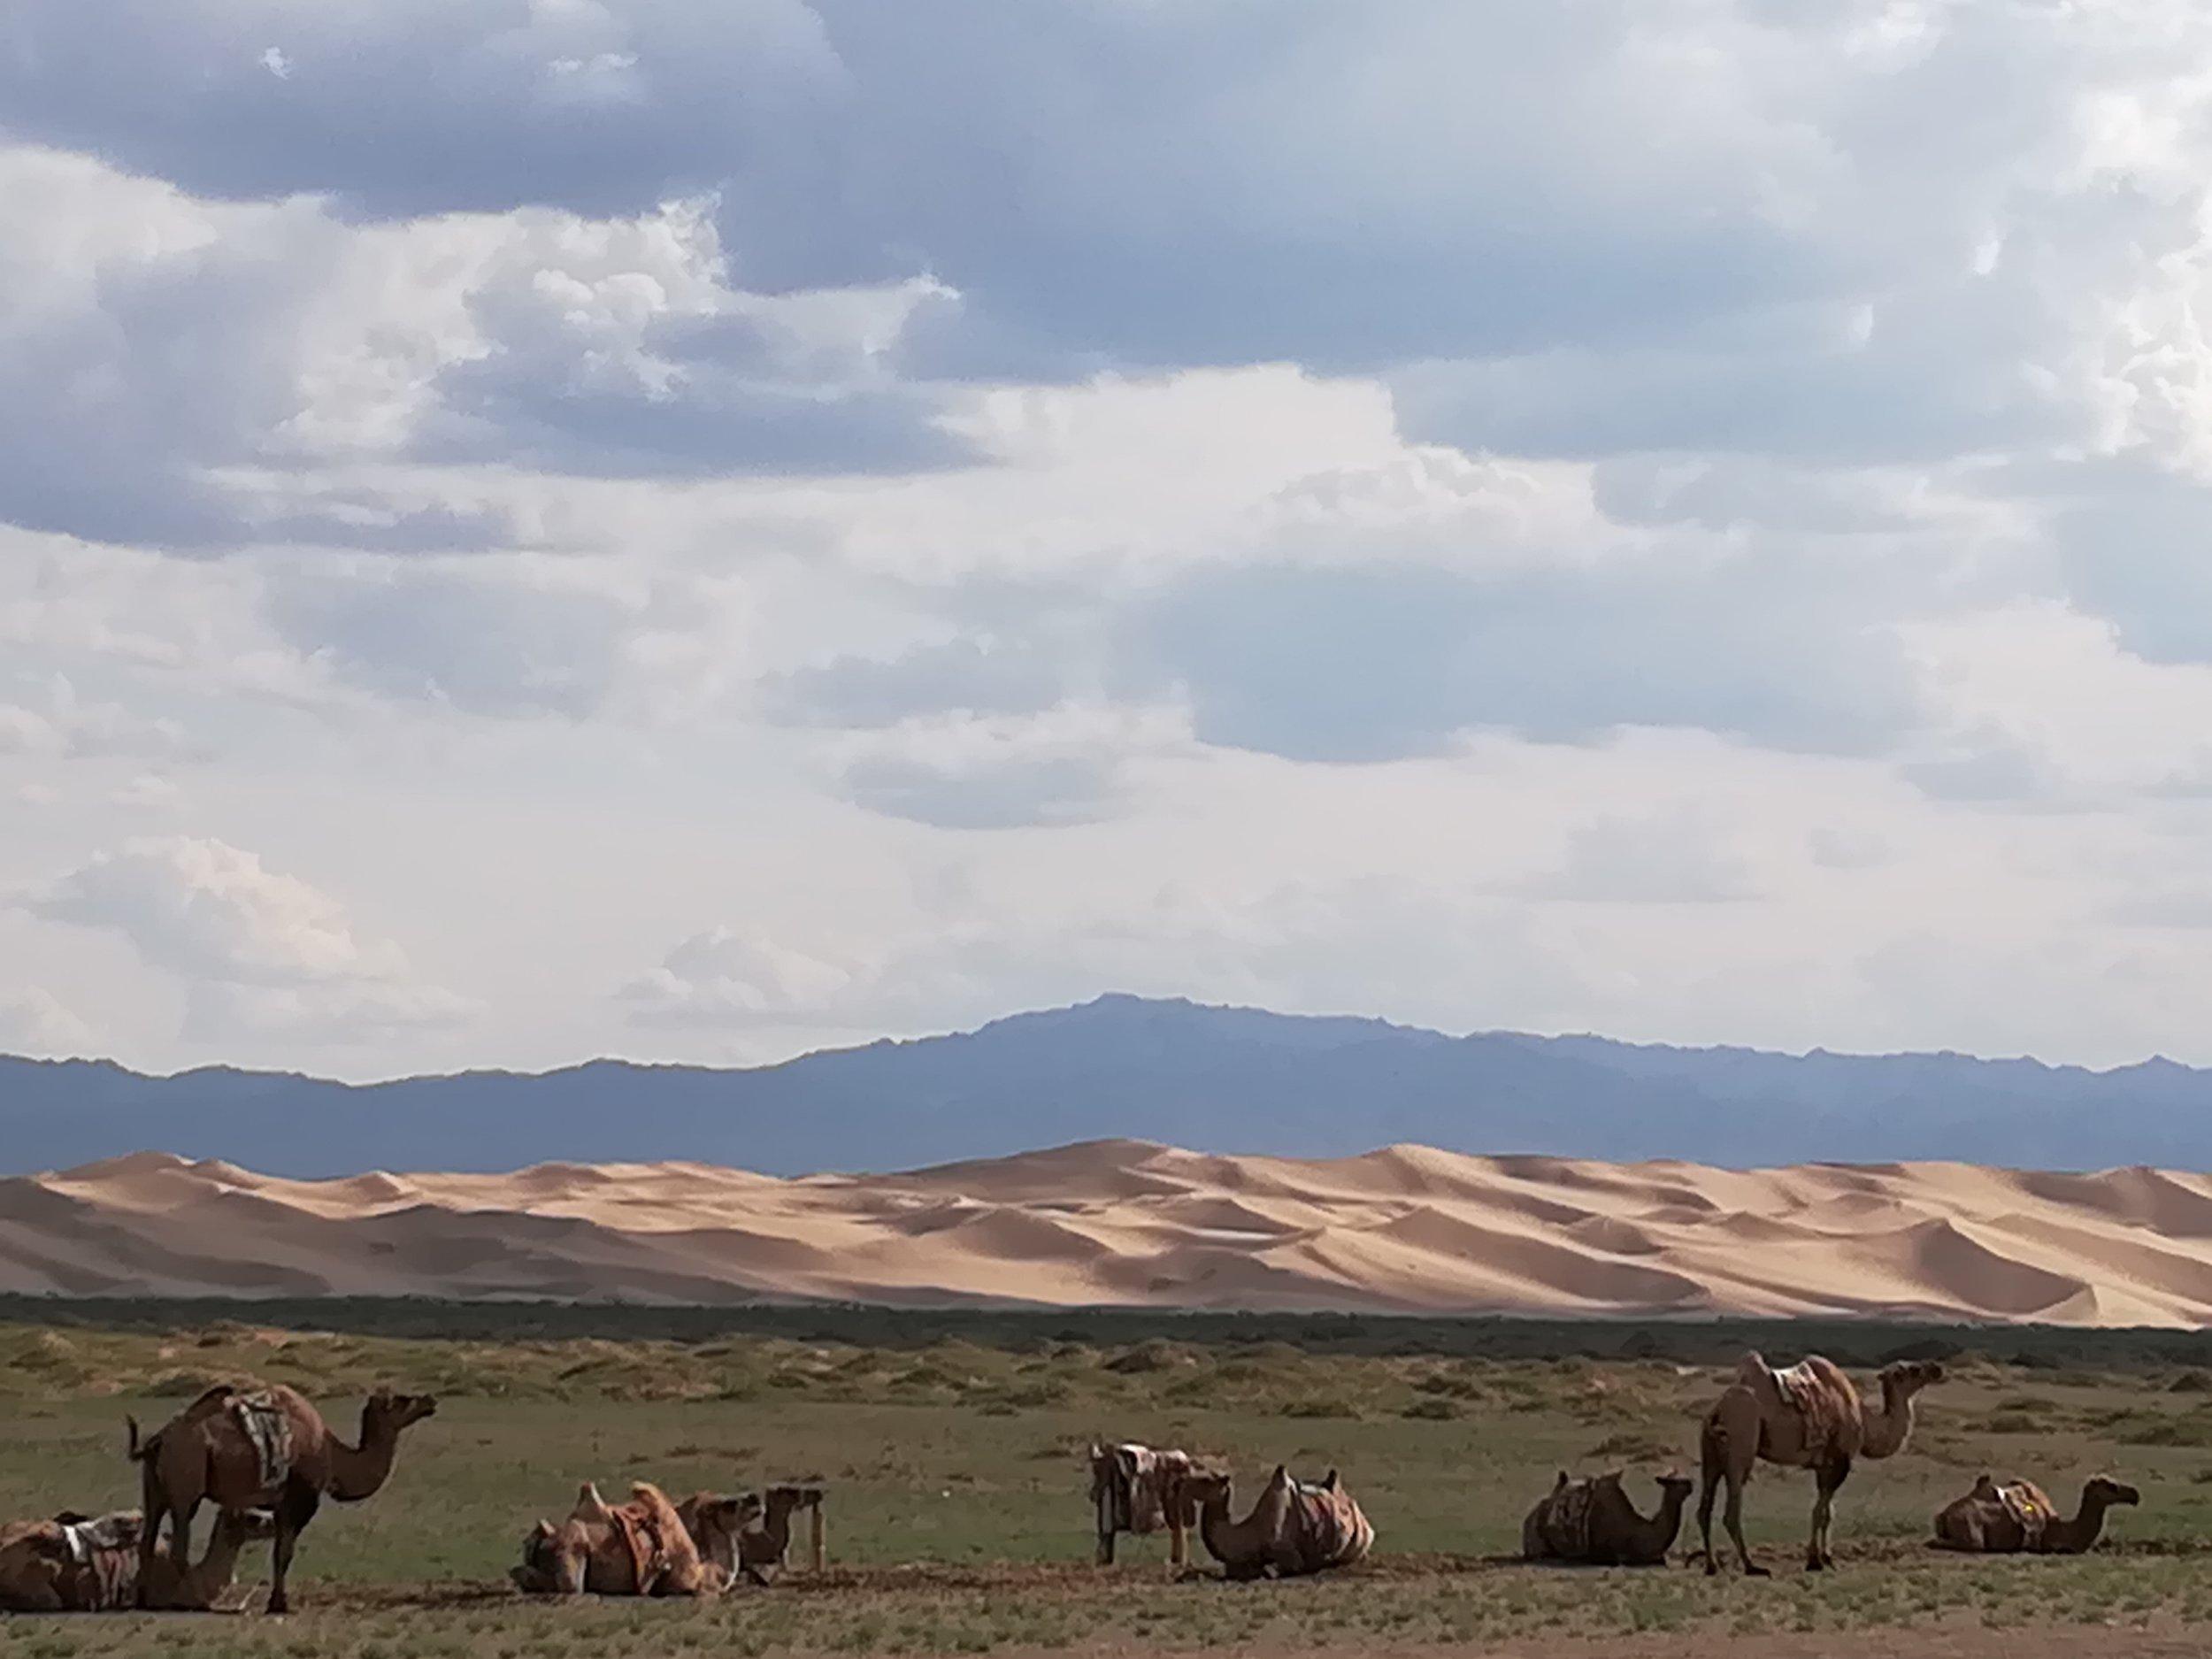 Sand dunes on the horizon